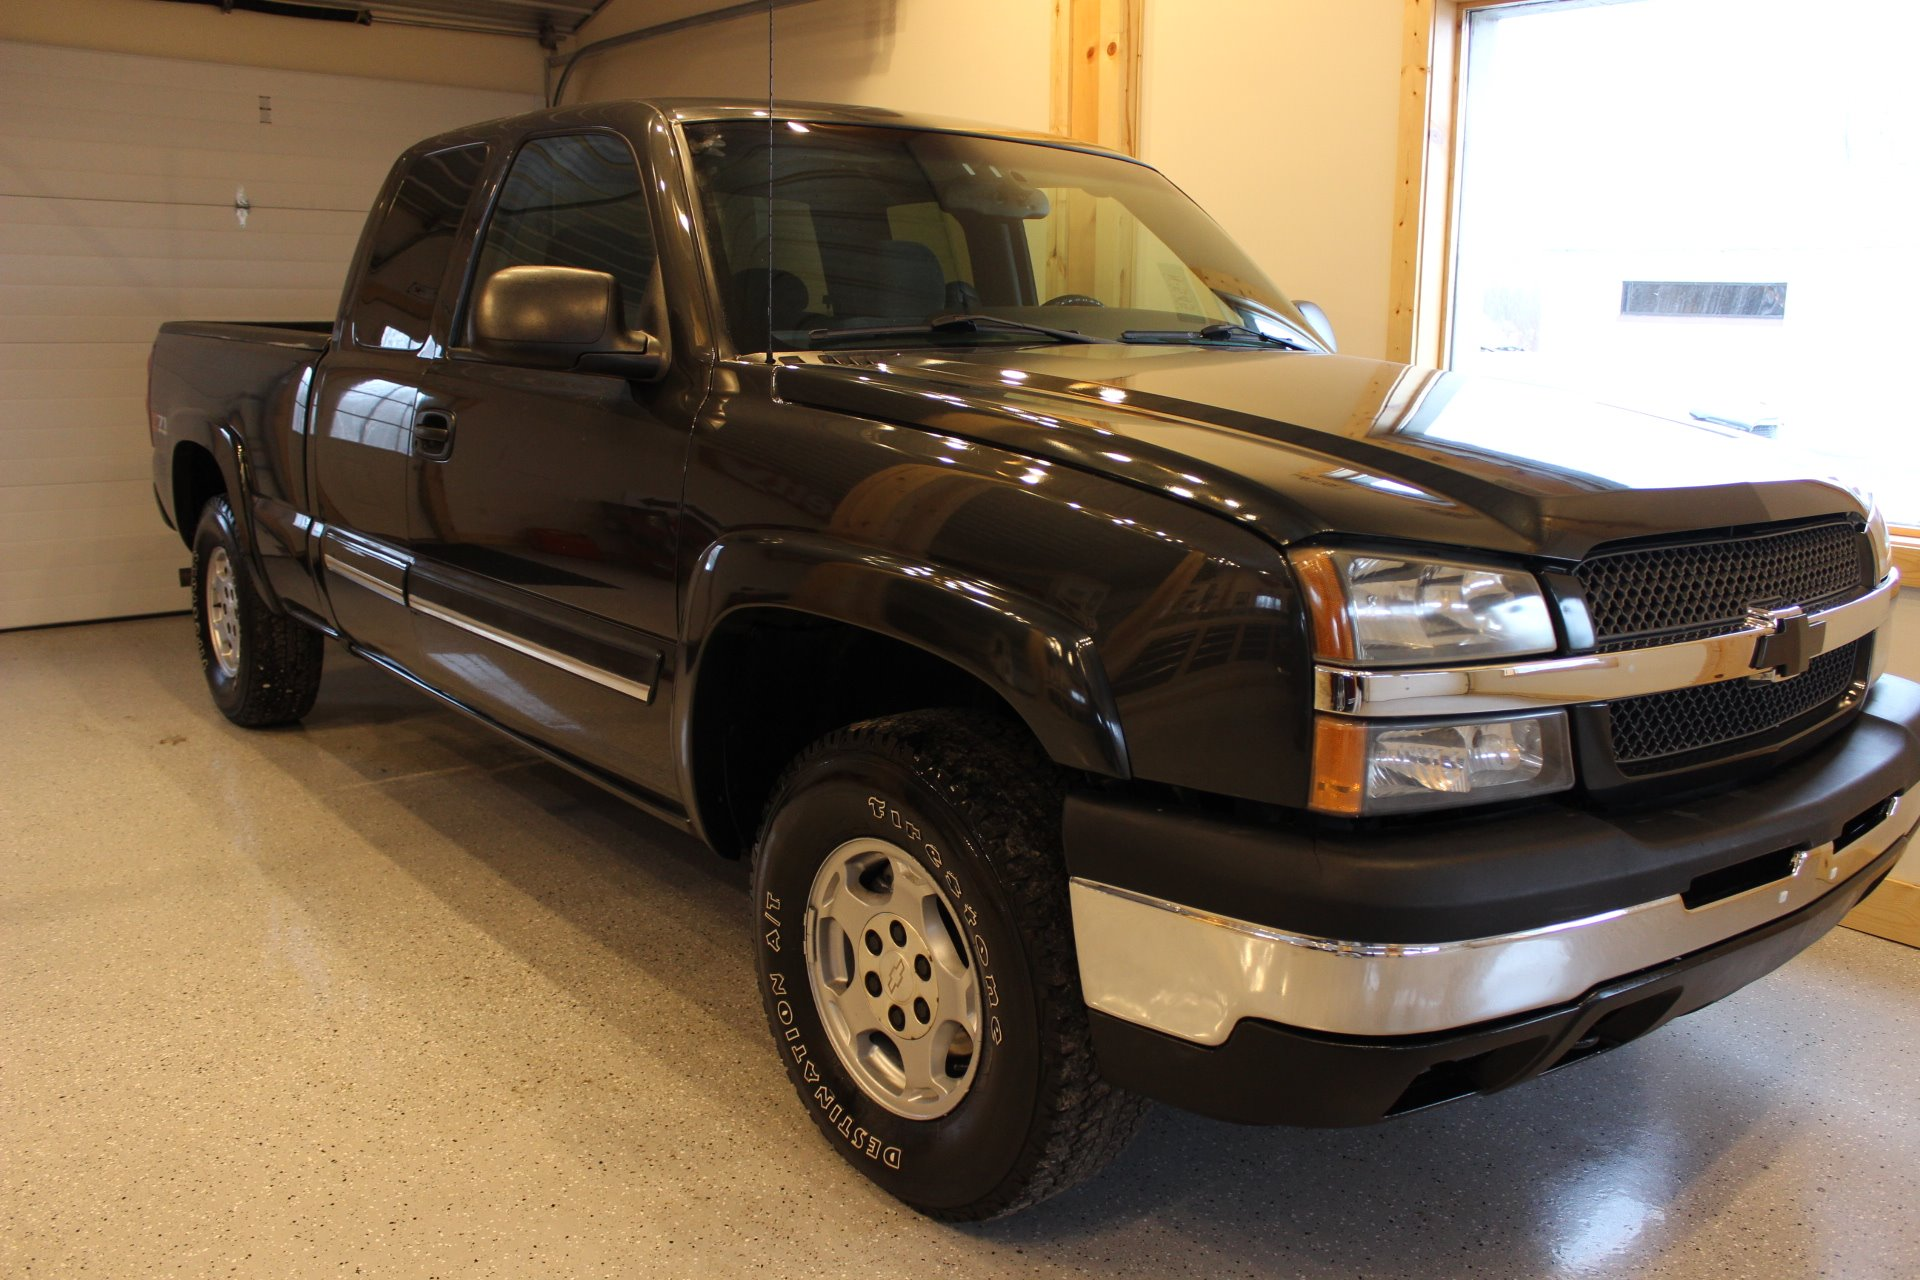 2003 chevrolet silverado 1500 ls z71 biscayne auto sales pre owned dealership ontario ny. Black Bedroom Furniture Sets. Home Design Ideas